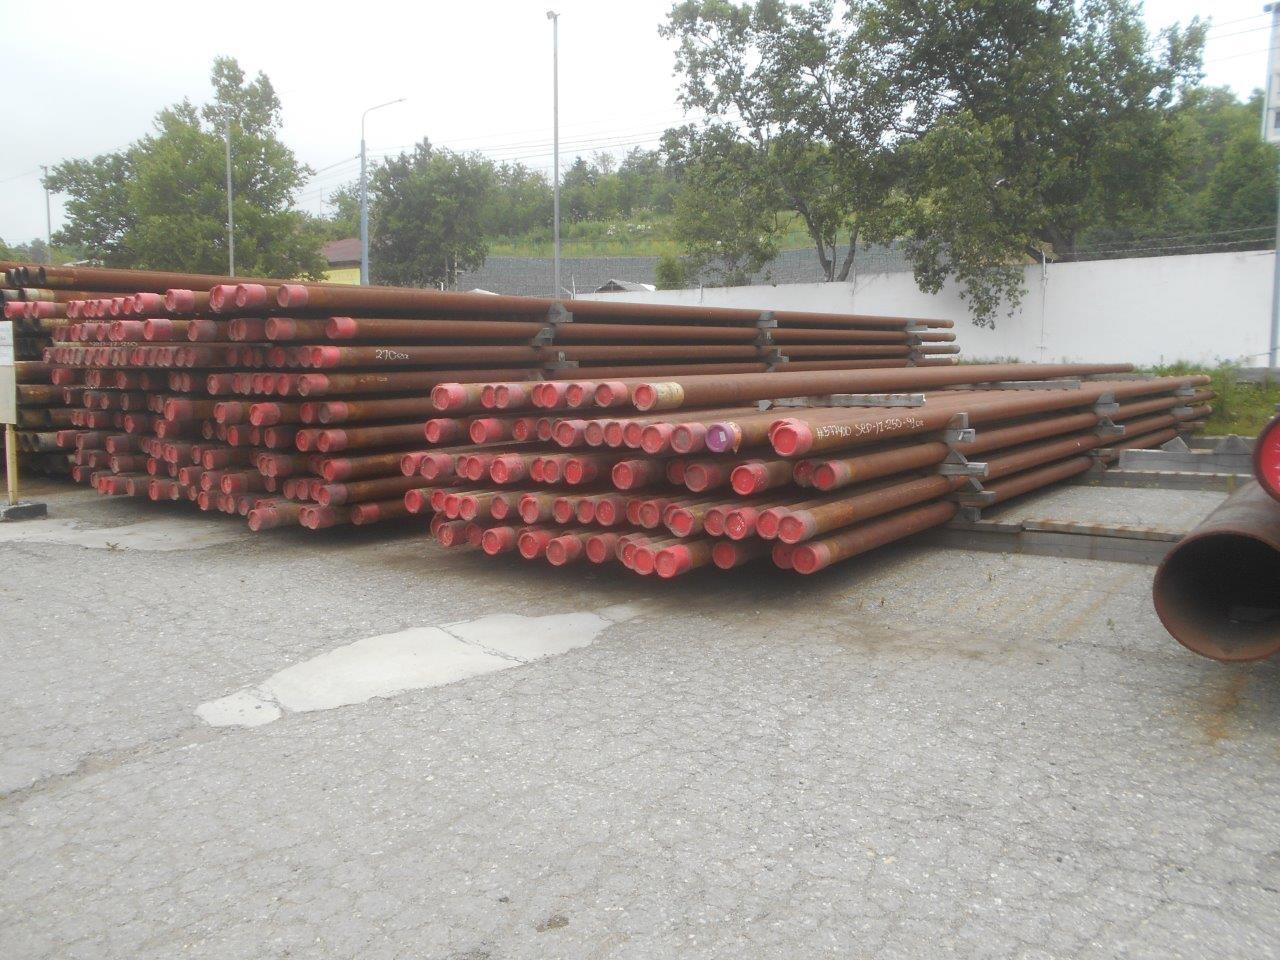 Труба насосно-компрессорная 139,7 мм, сталь, Б/У, 320 шт. (17-250-5)